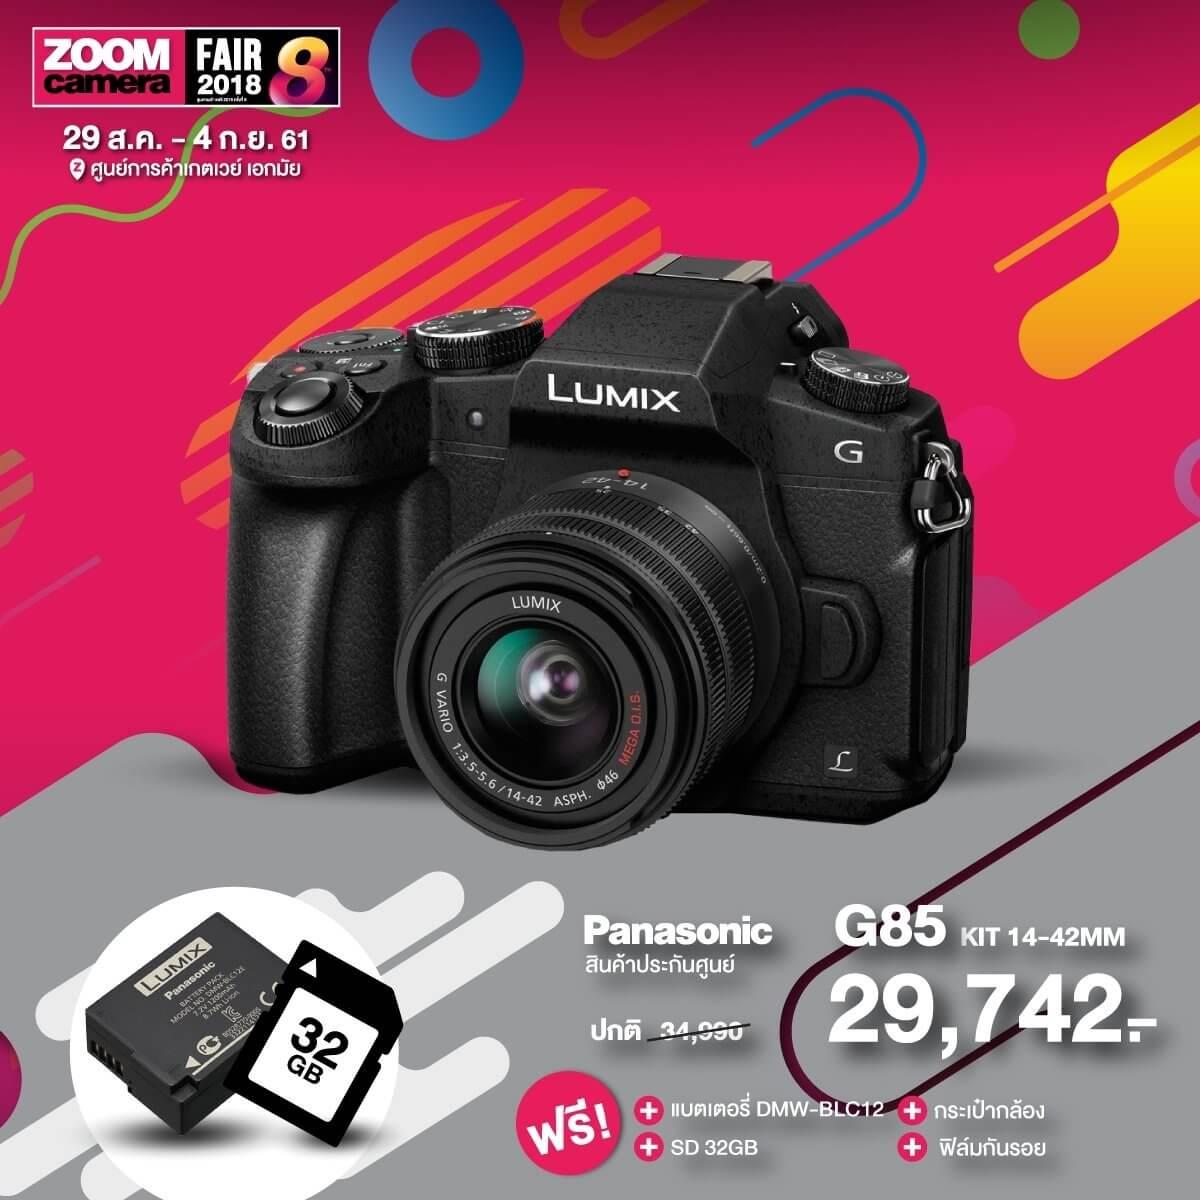 panasonic lumix g85 kit1442 promotion